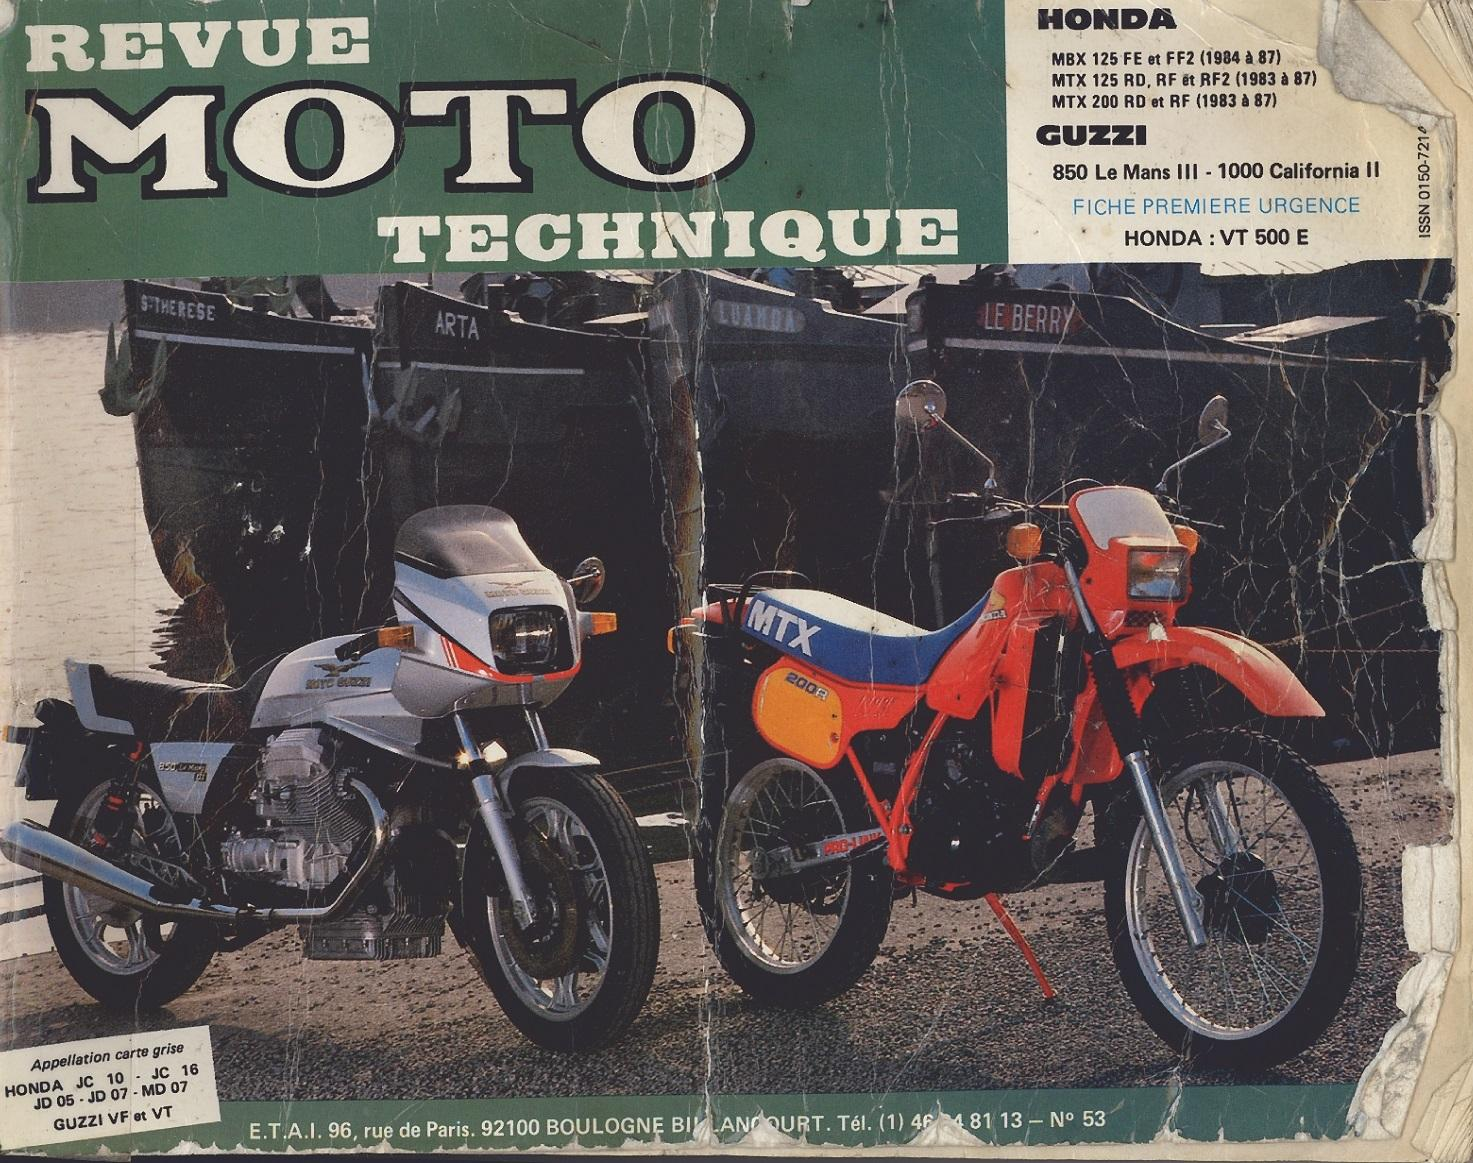 Workshop Manual for Honda MTX125RF (1983-1987)